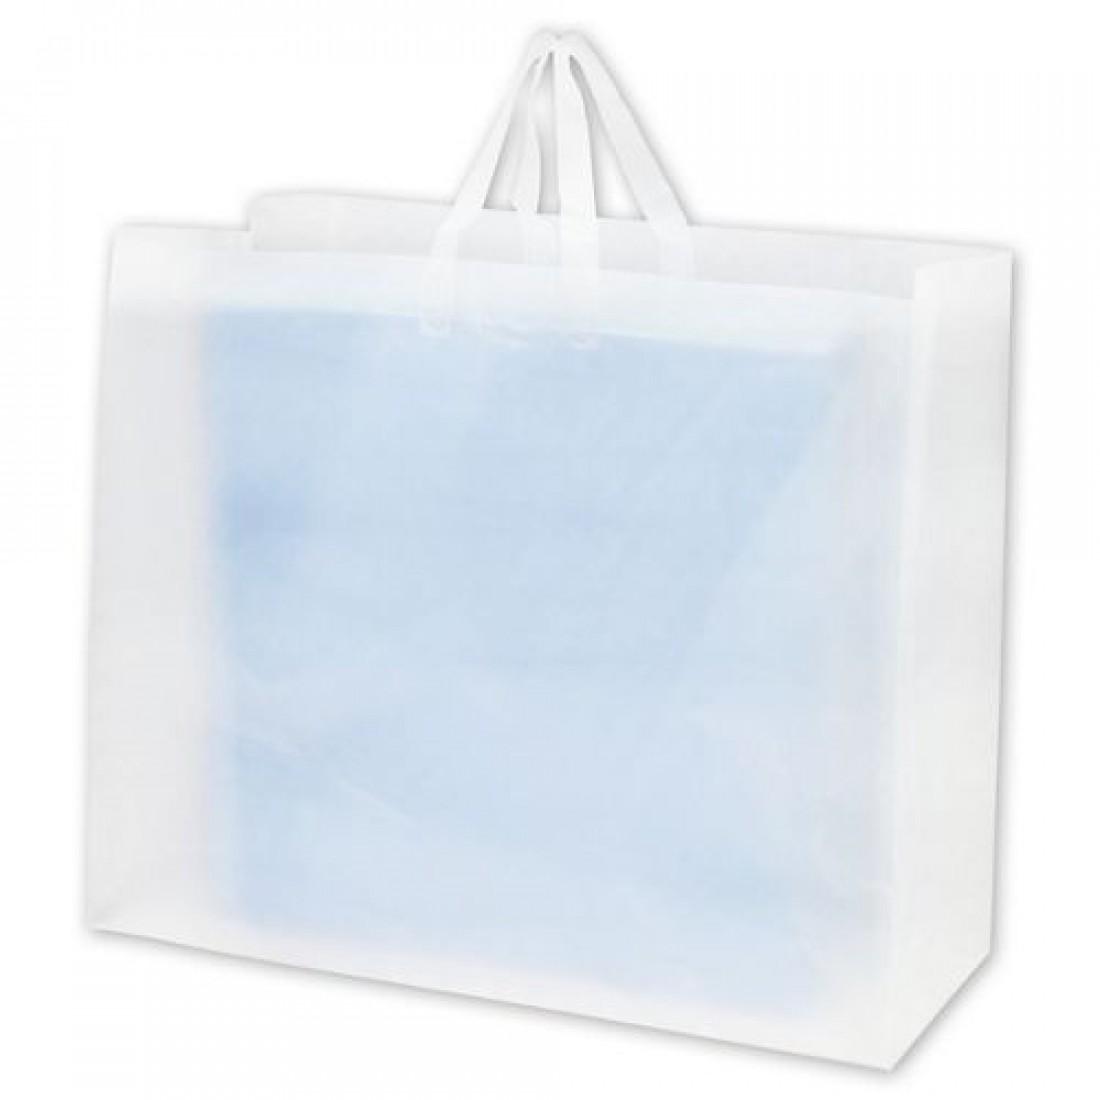 ClearFrost HiDen Bag 24x9x20